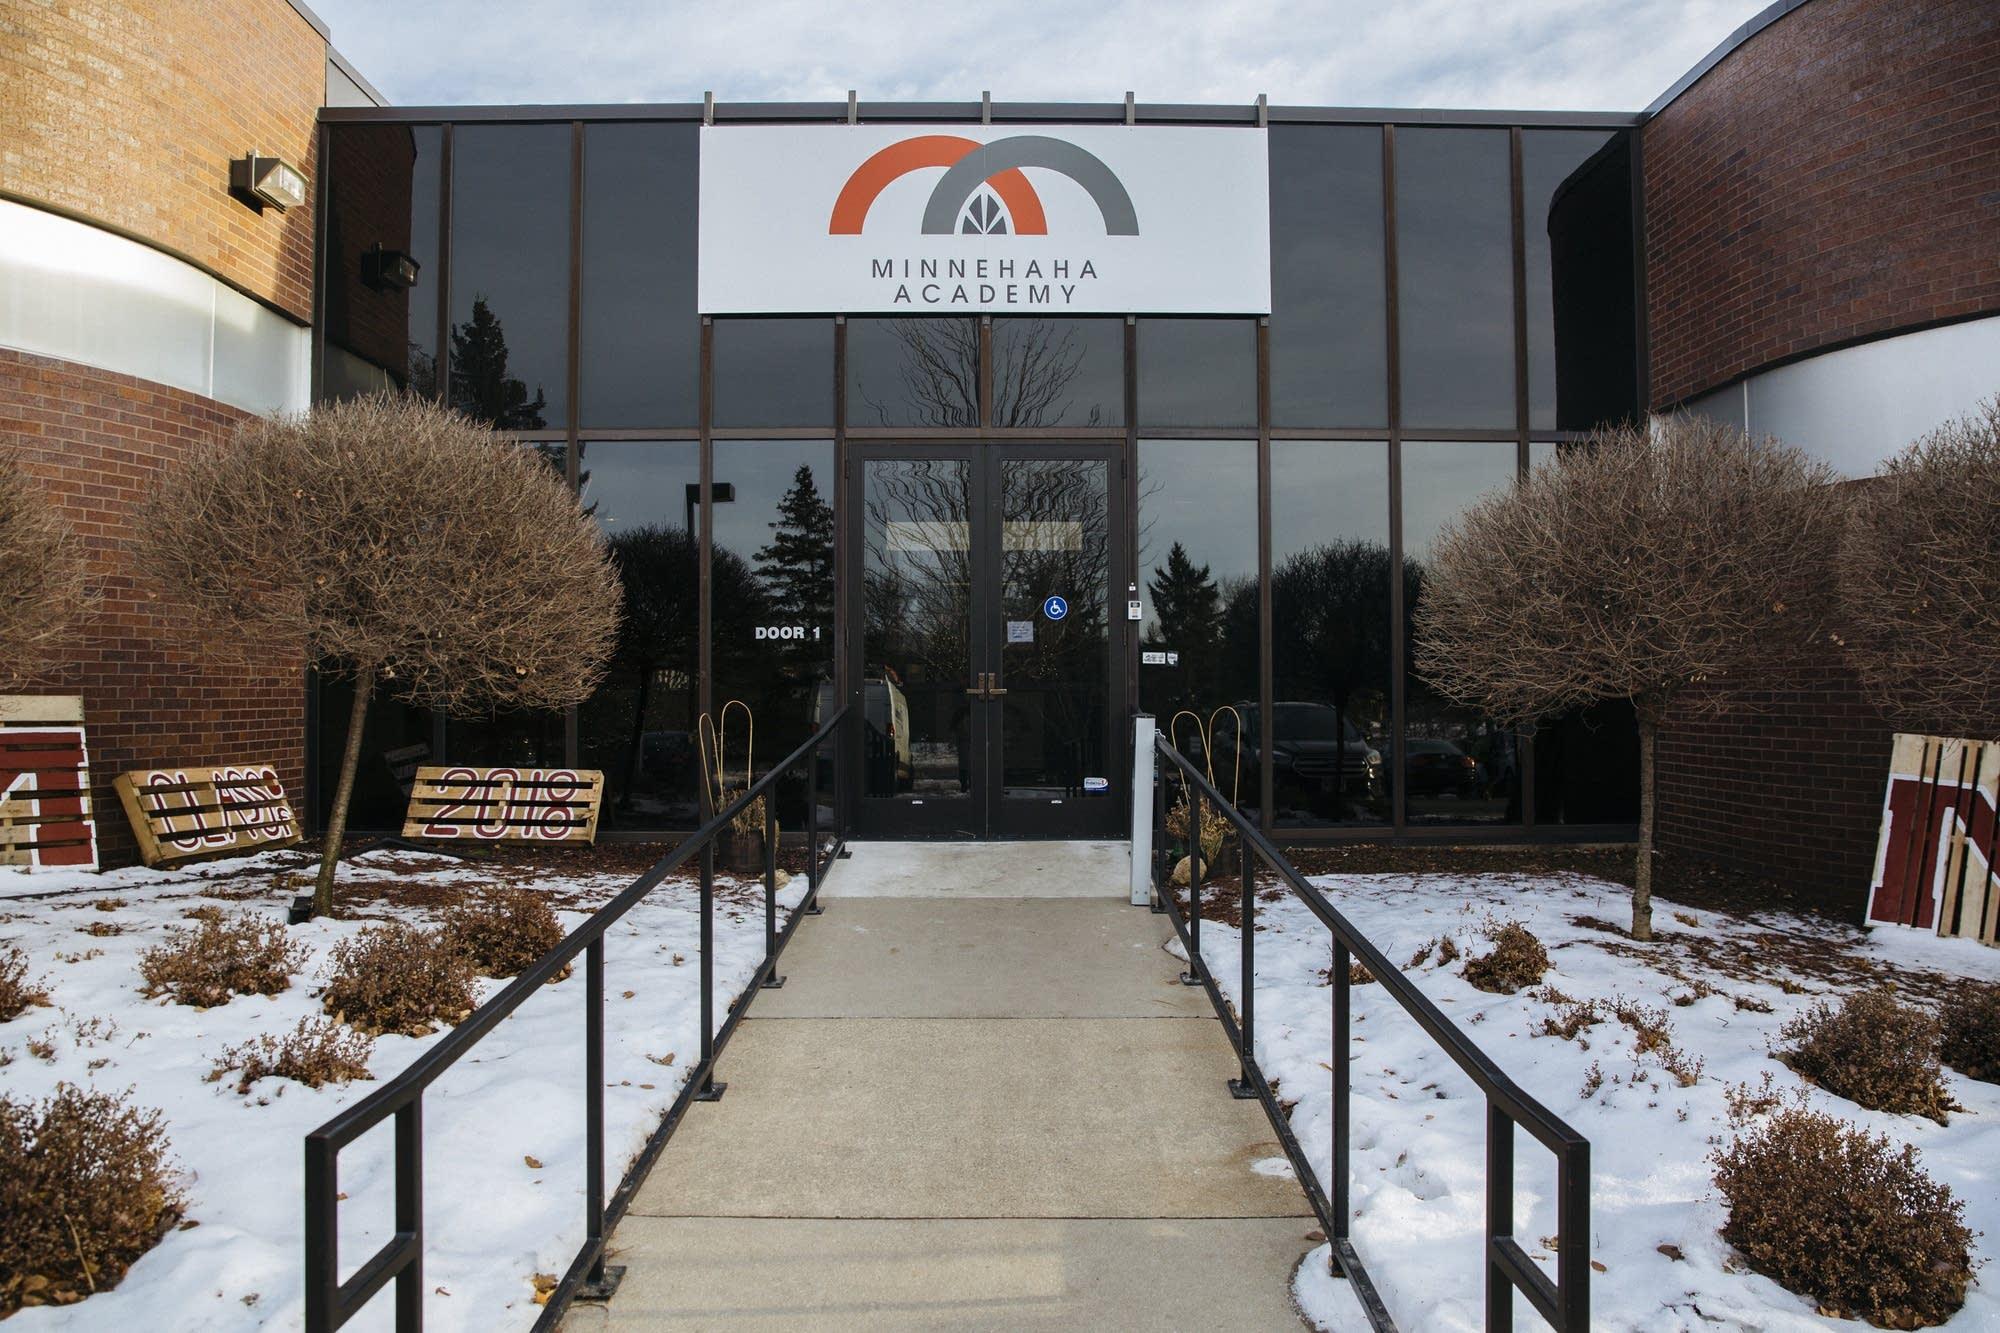 The entrance to the Minnehaha Academy Upper School's temporary location.